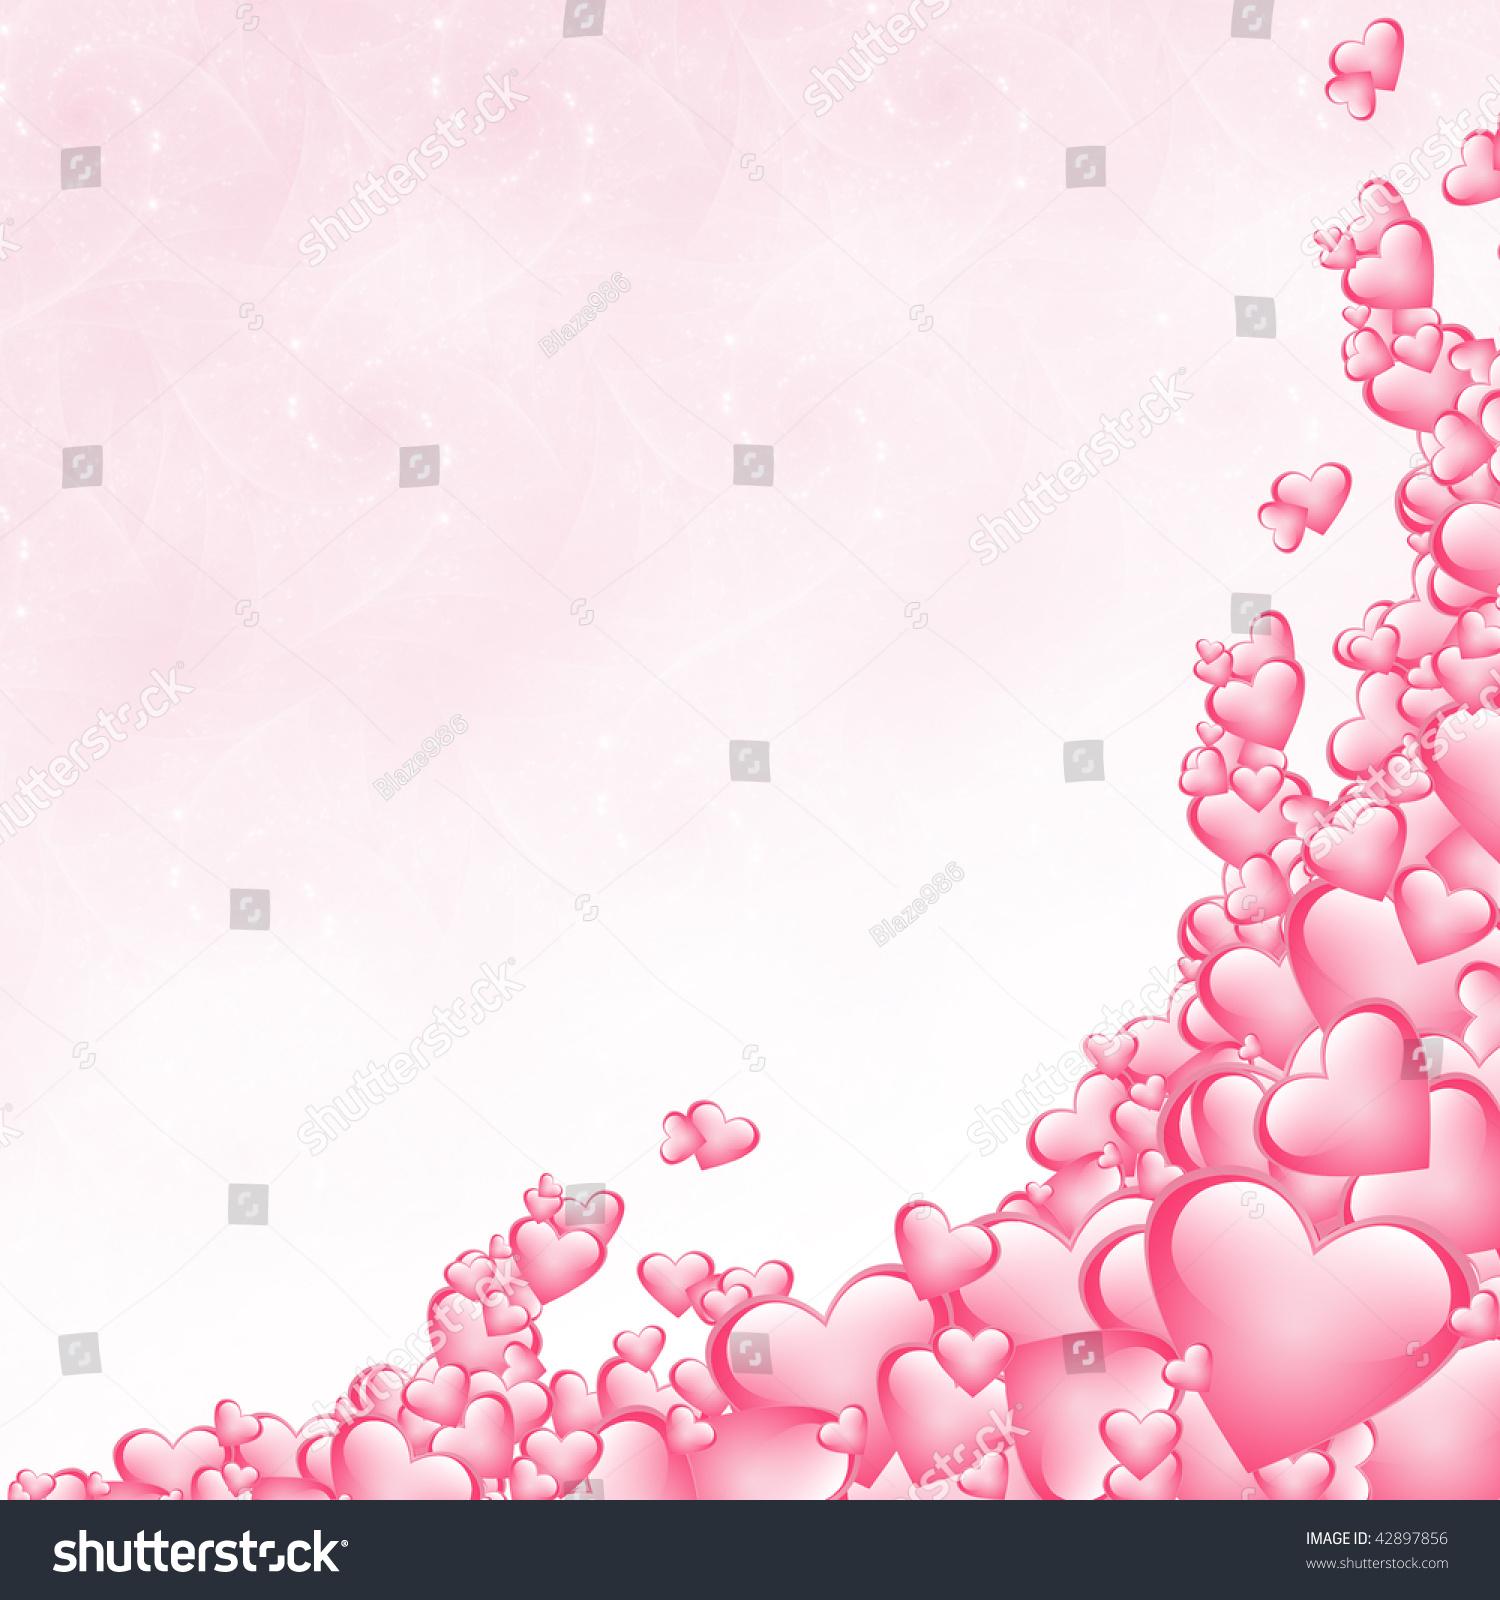 pink hearts background valentines card stock illustration 42897856